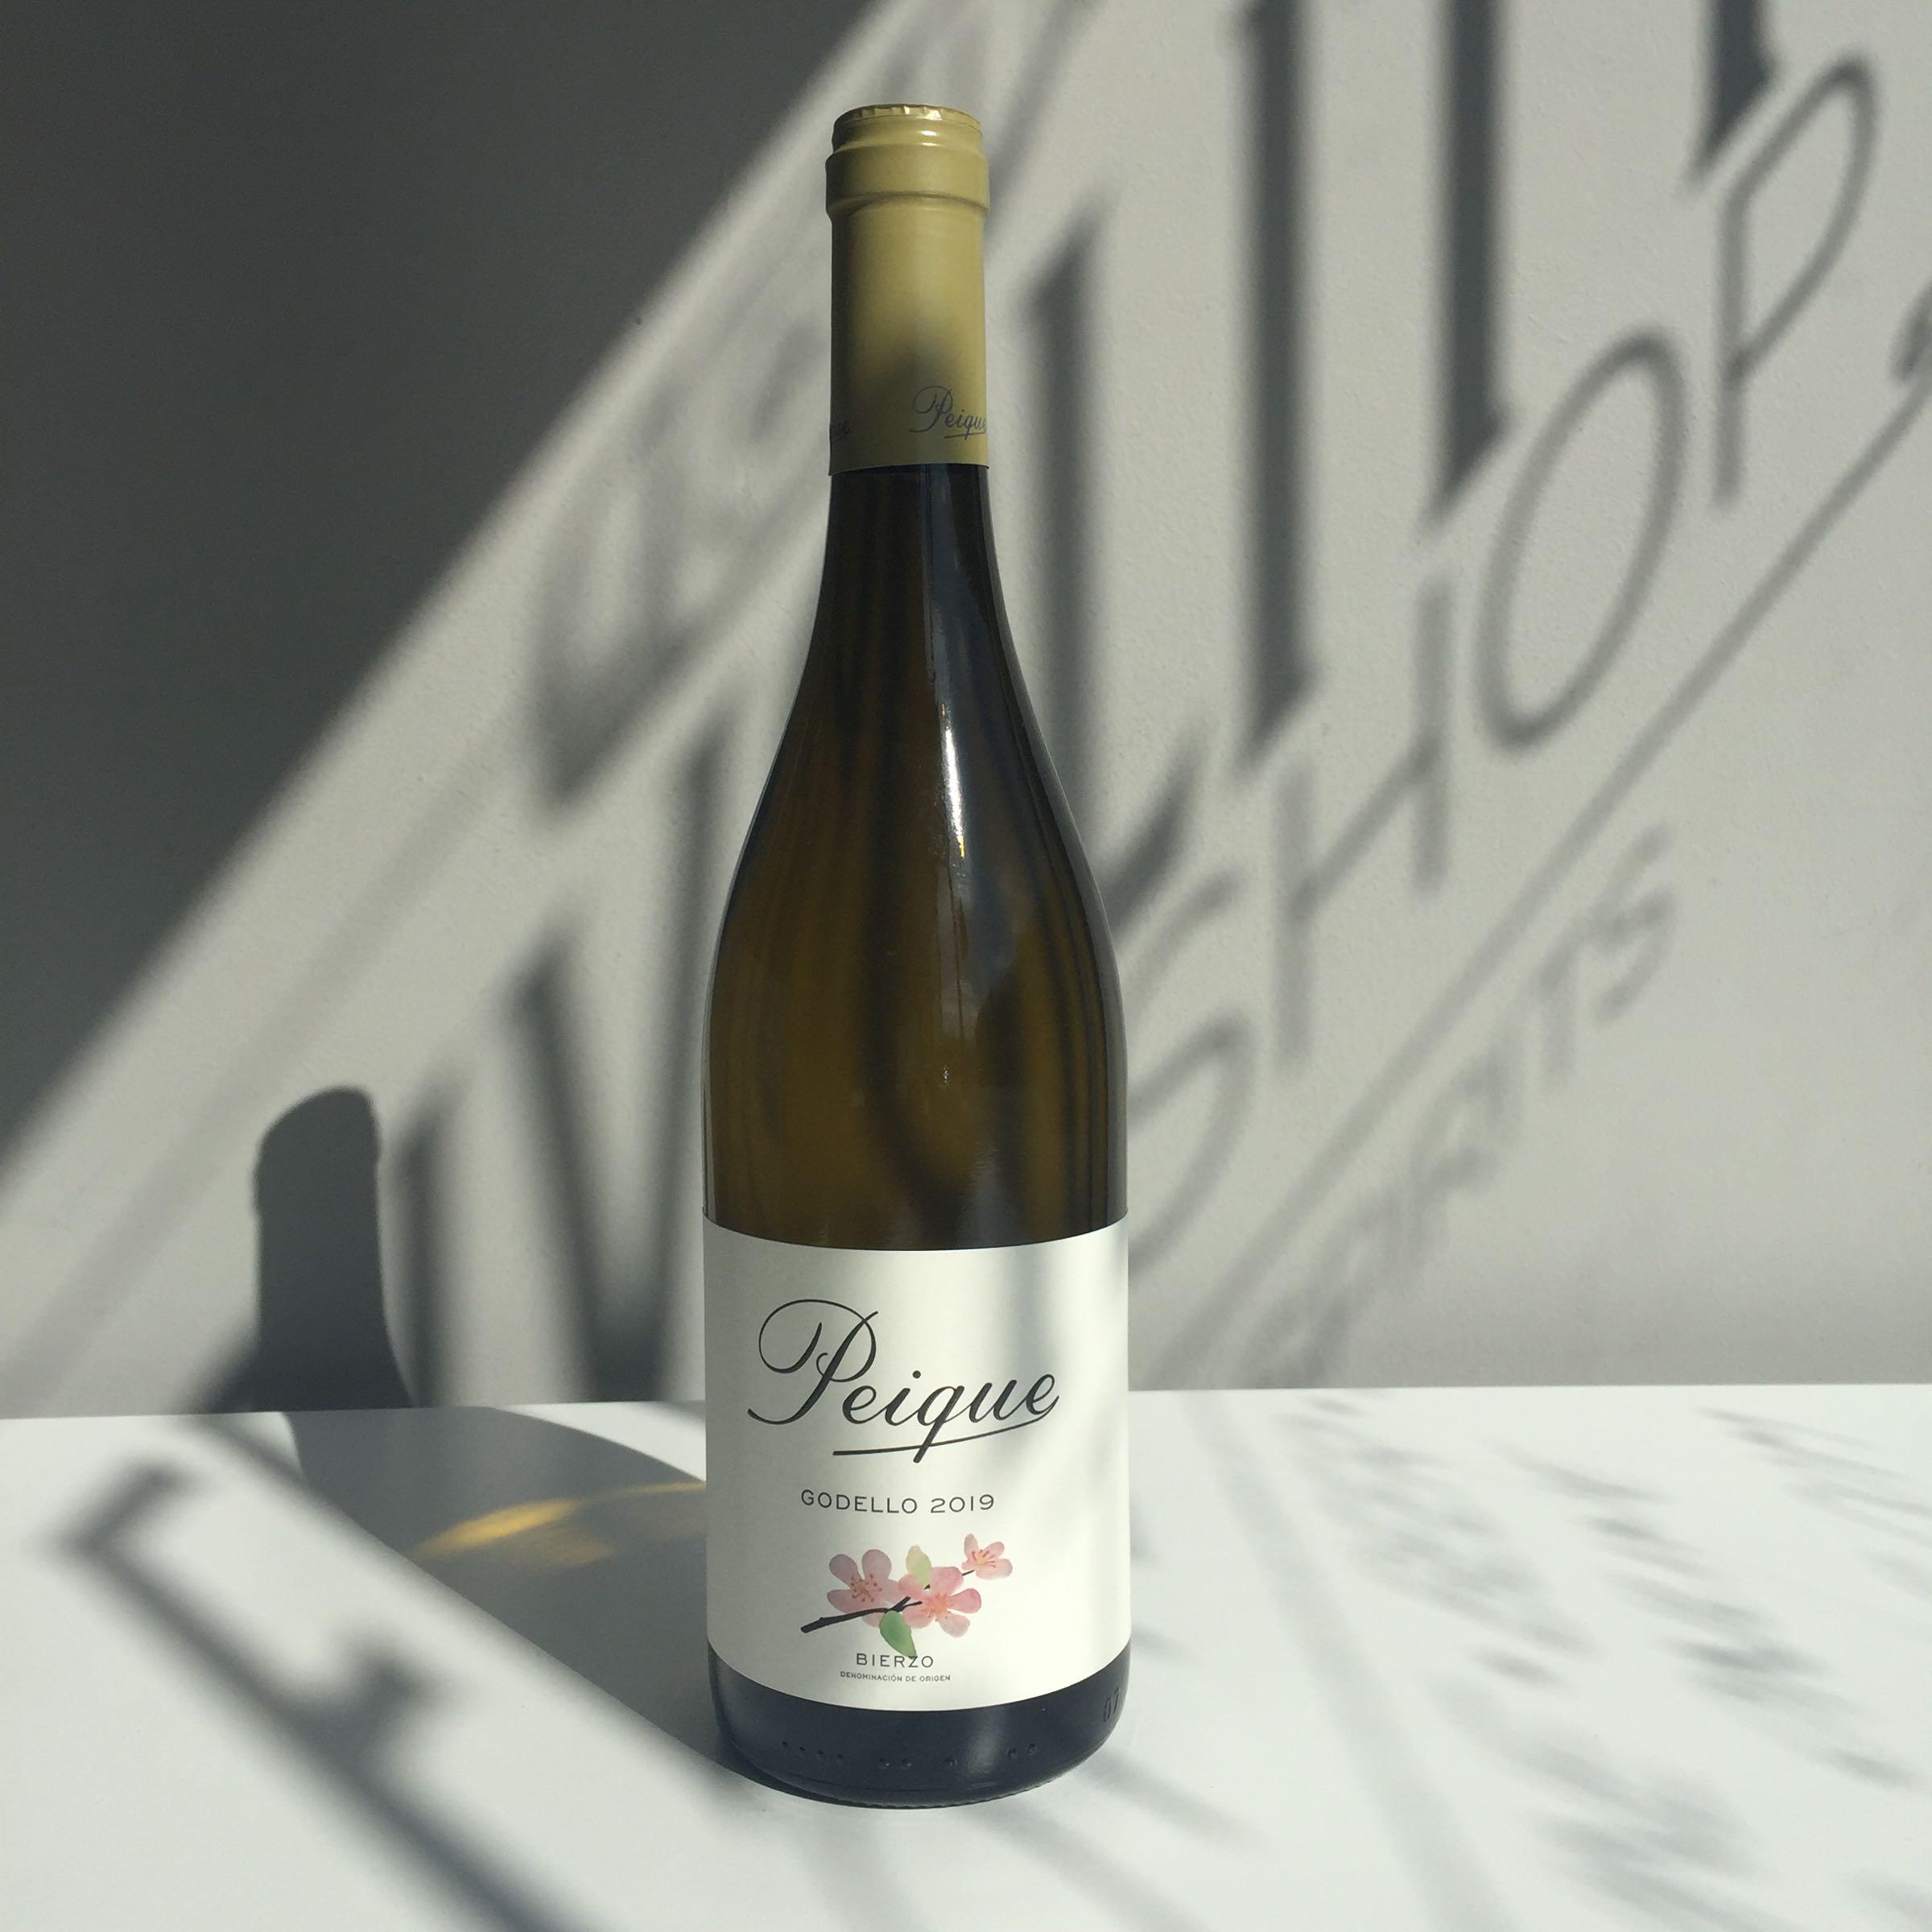 Peique - Godello 2019